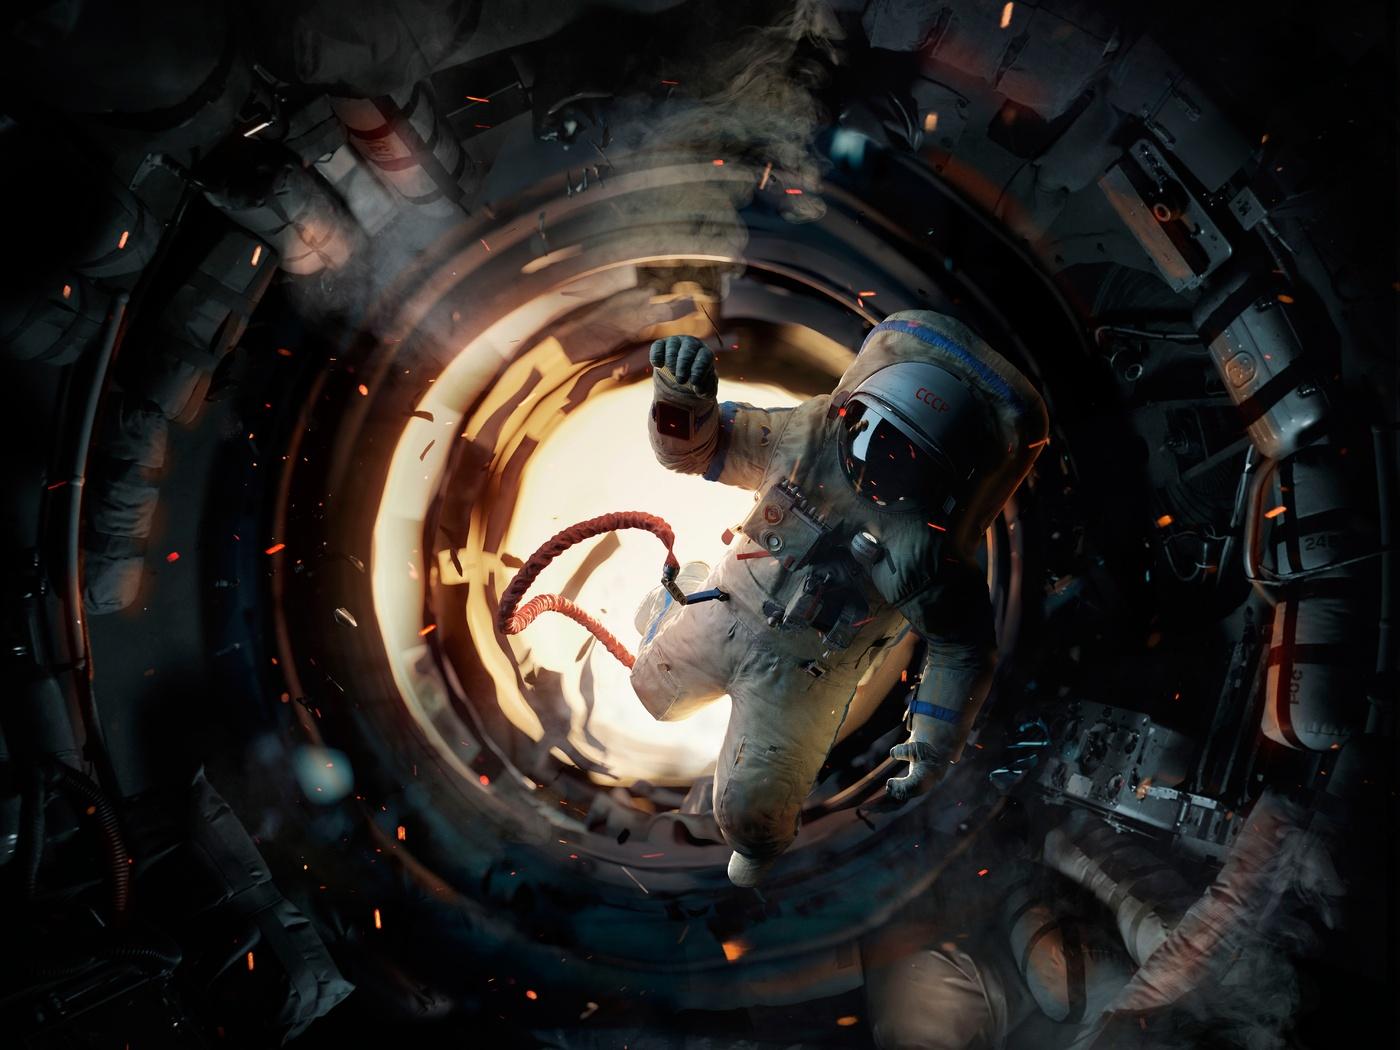 astronaut-space-art-5k-qm.jpg